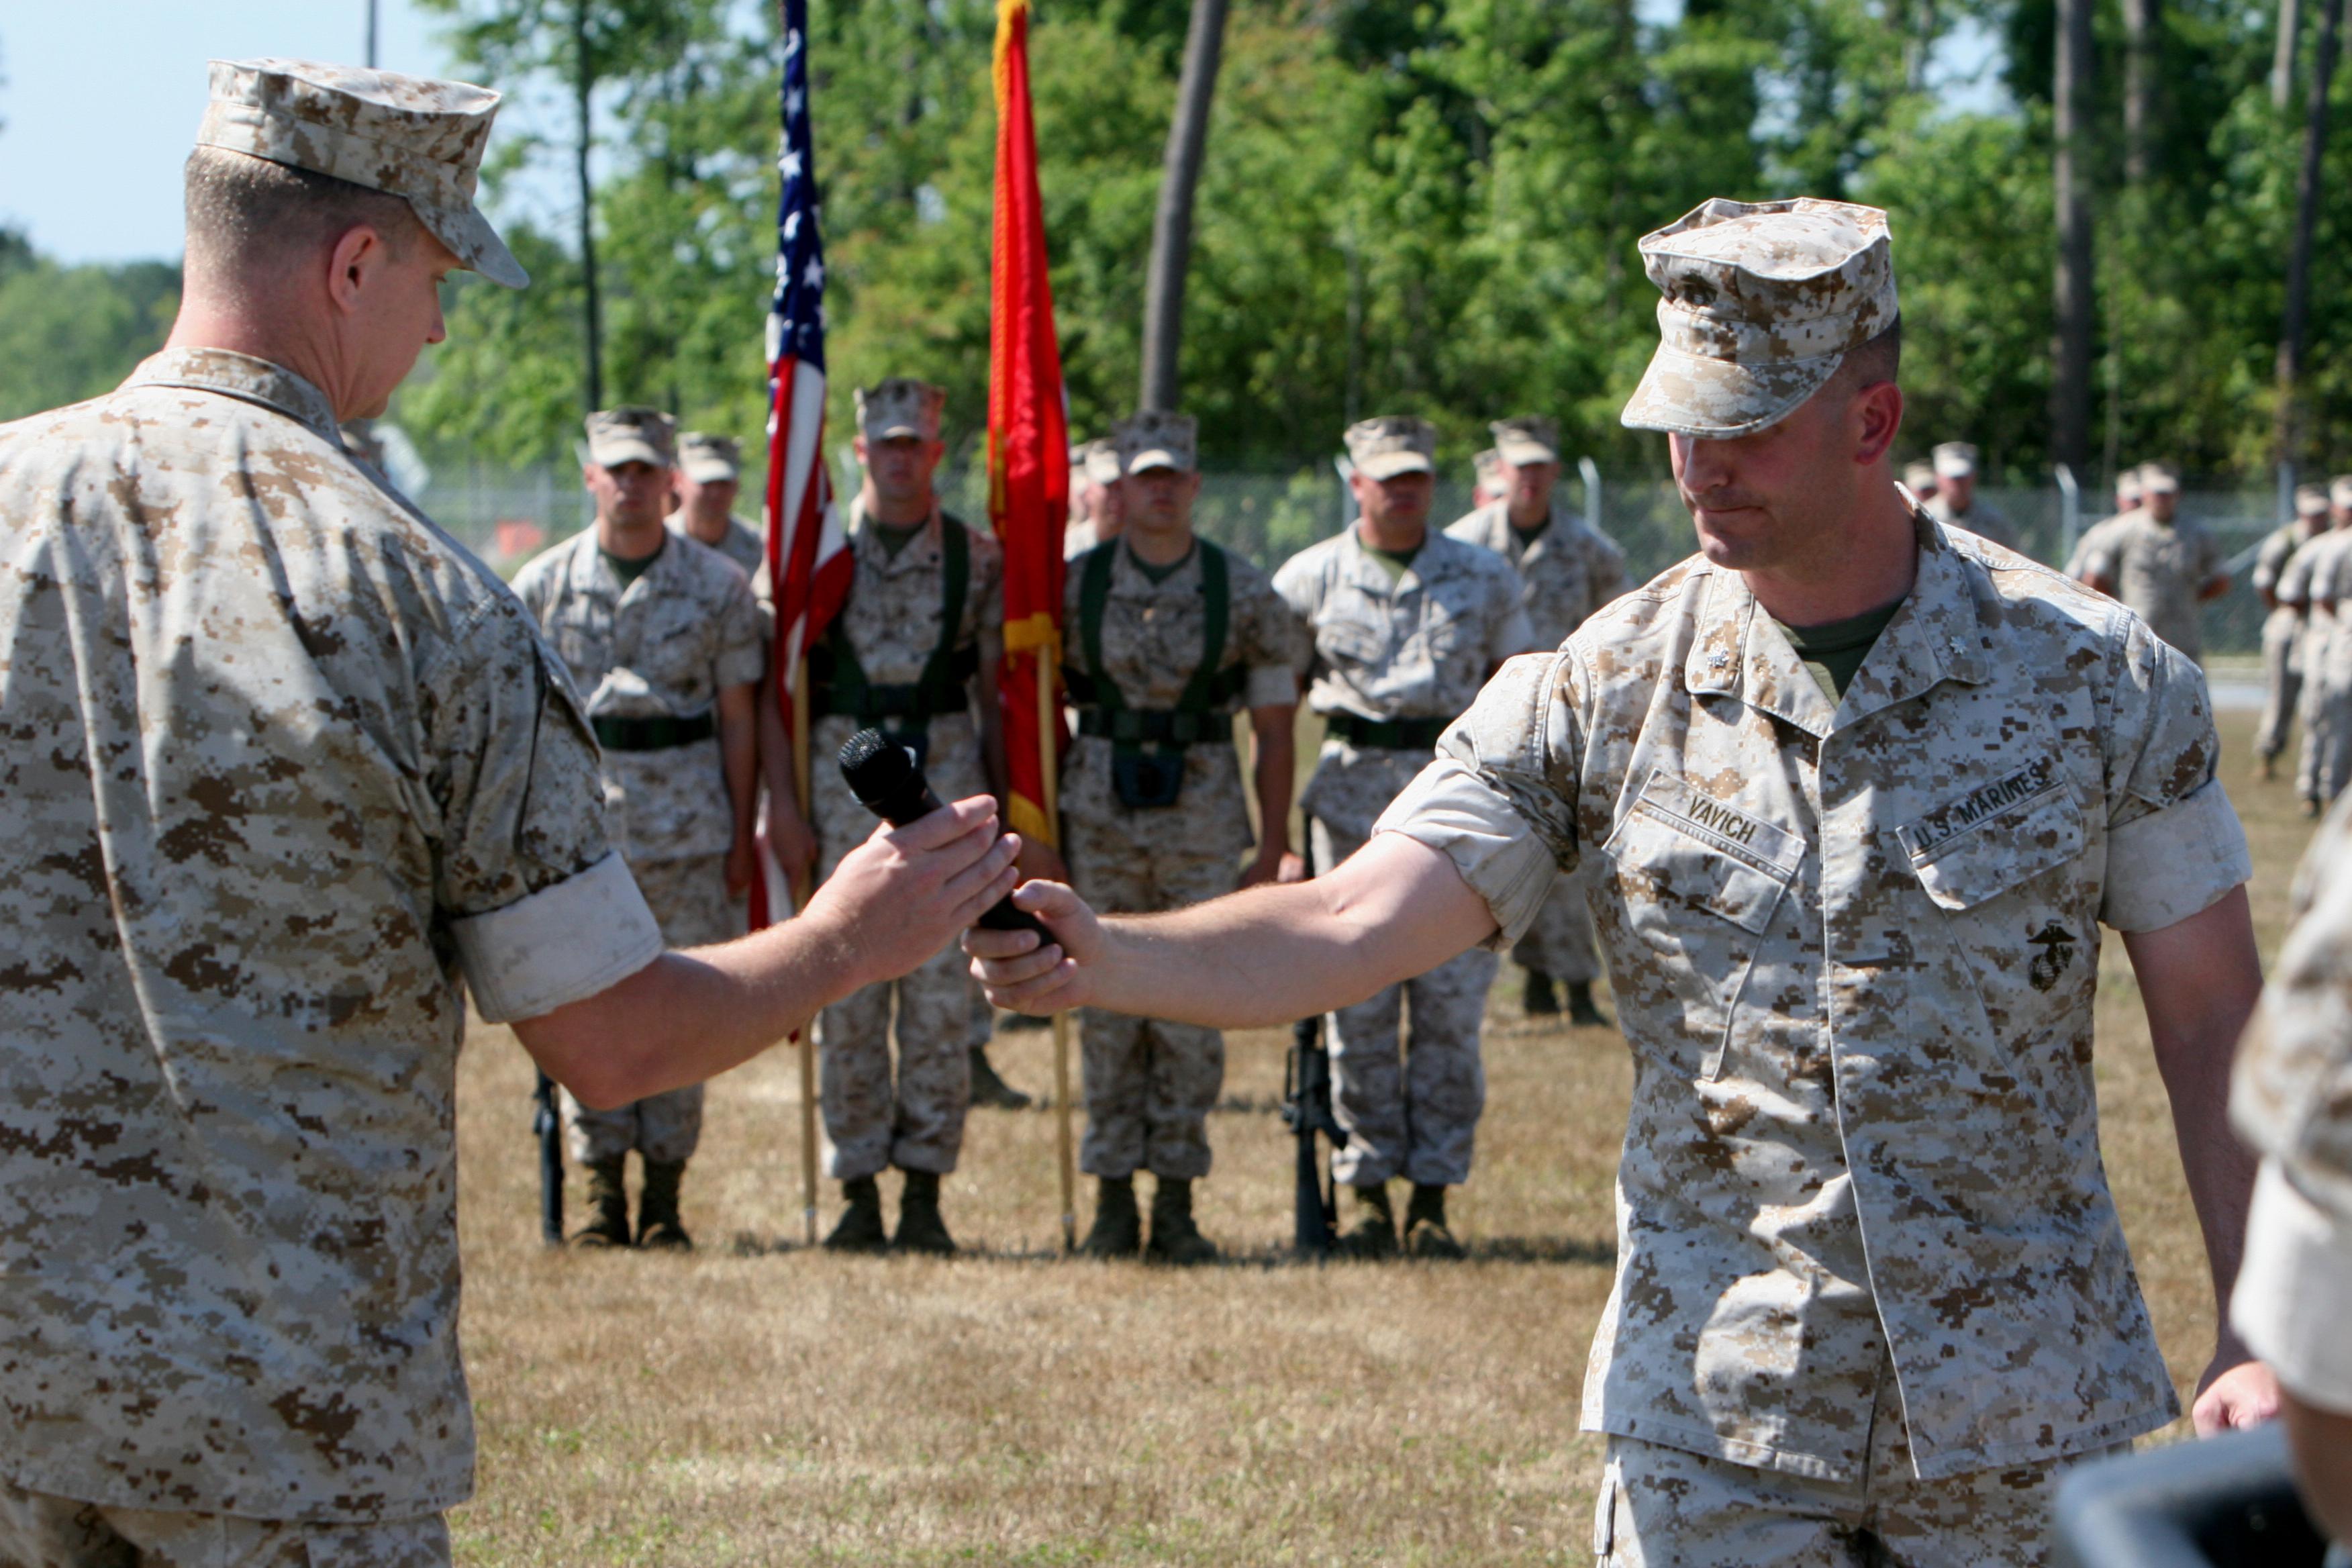 battalion commander forces transsexual Special